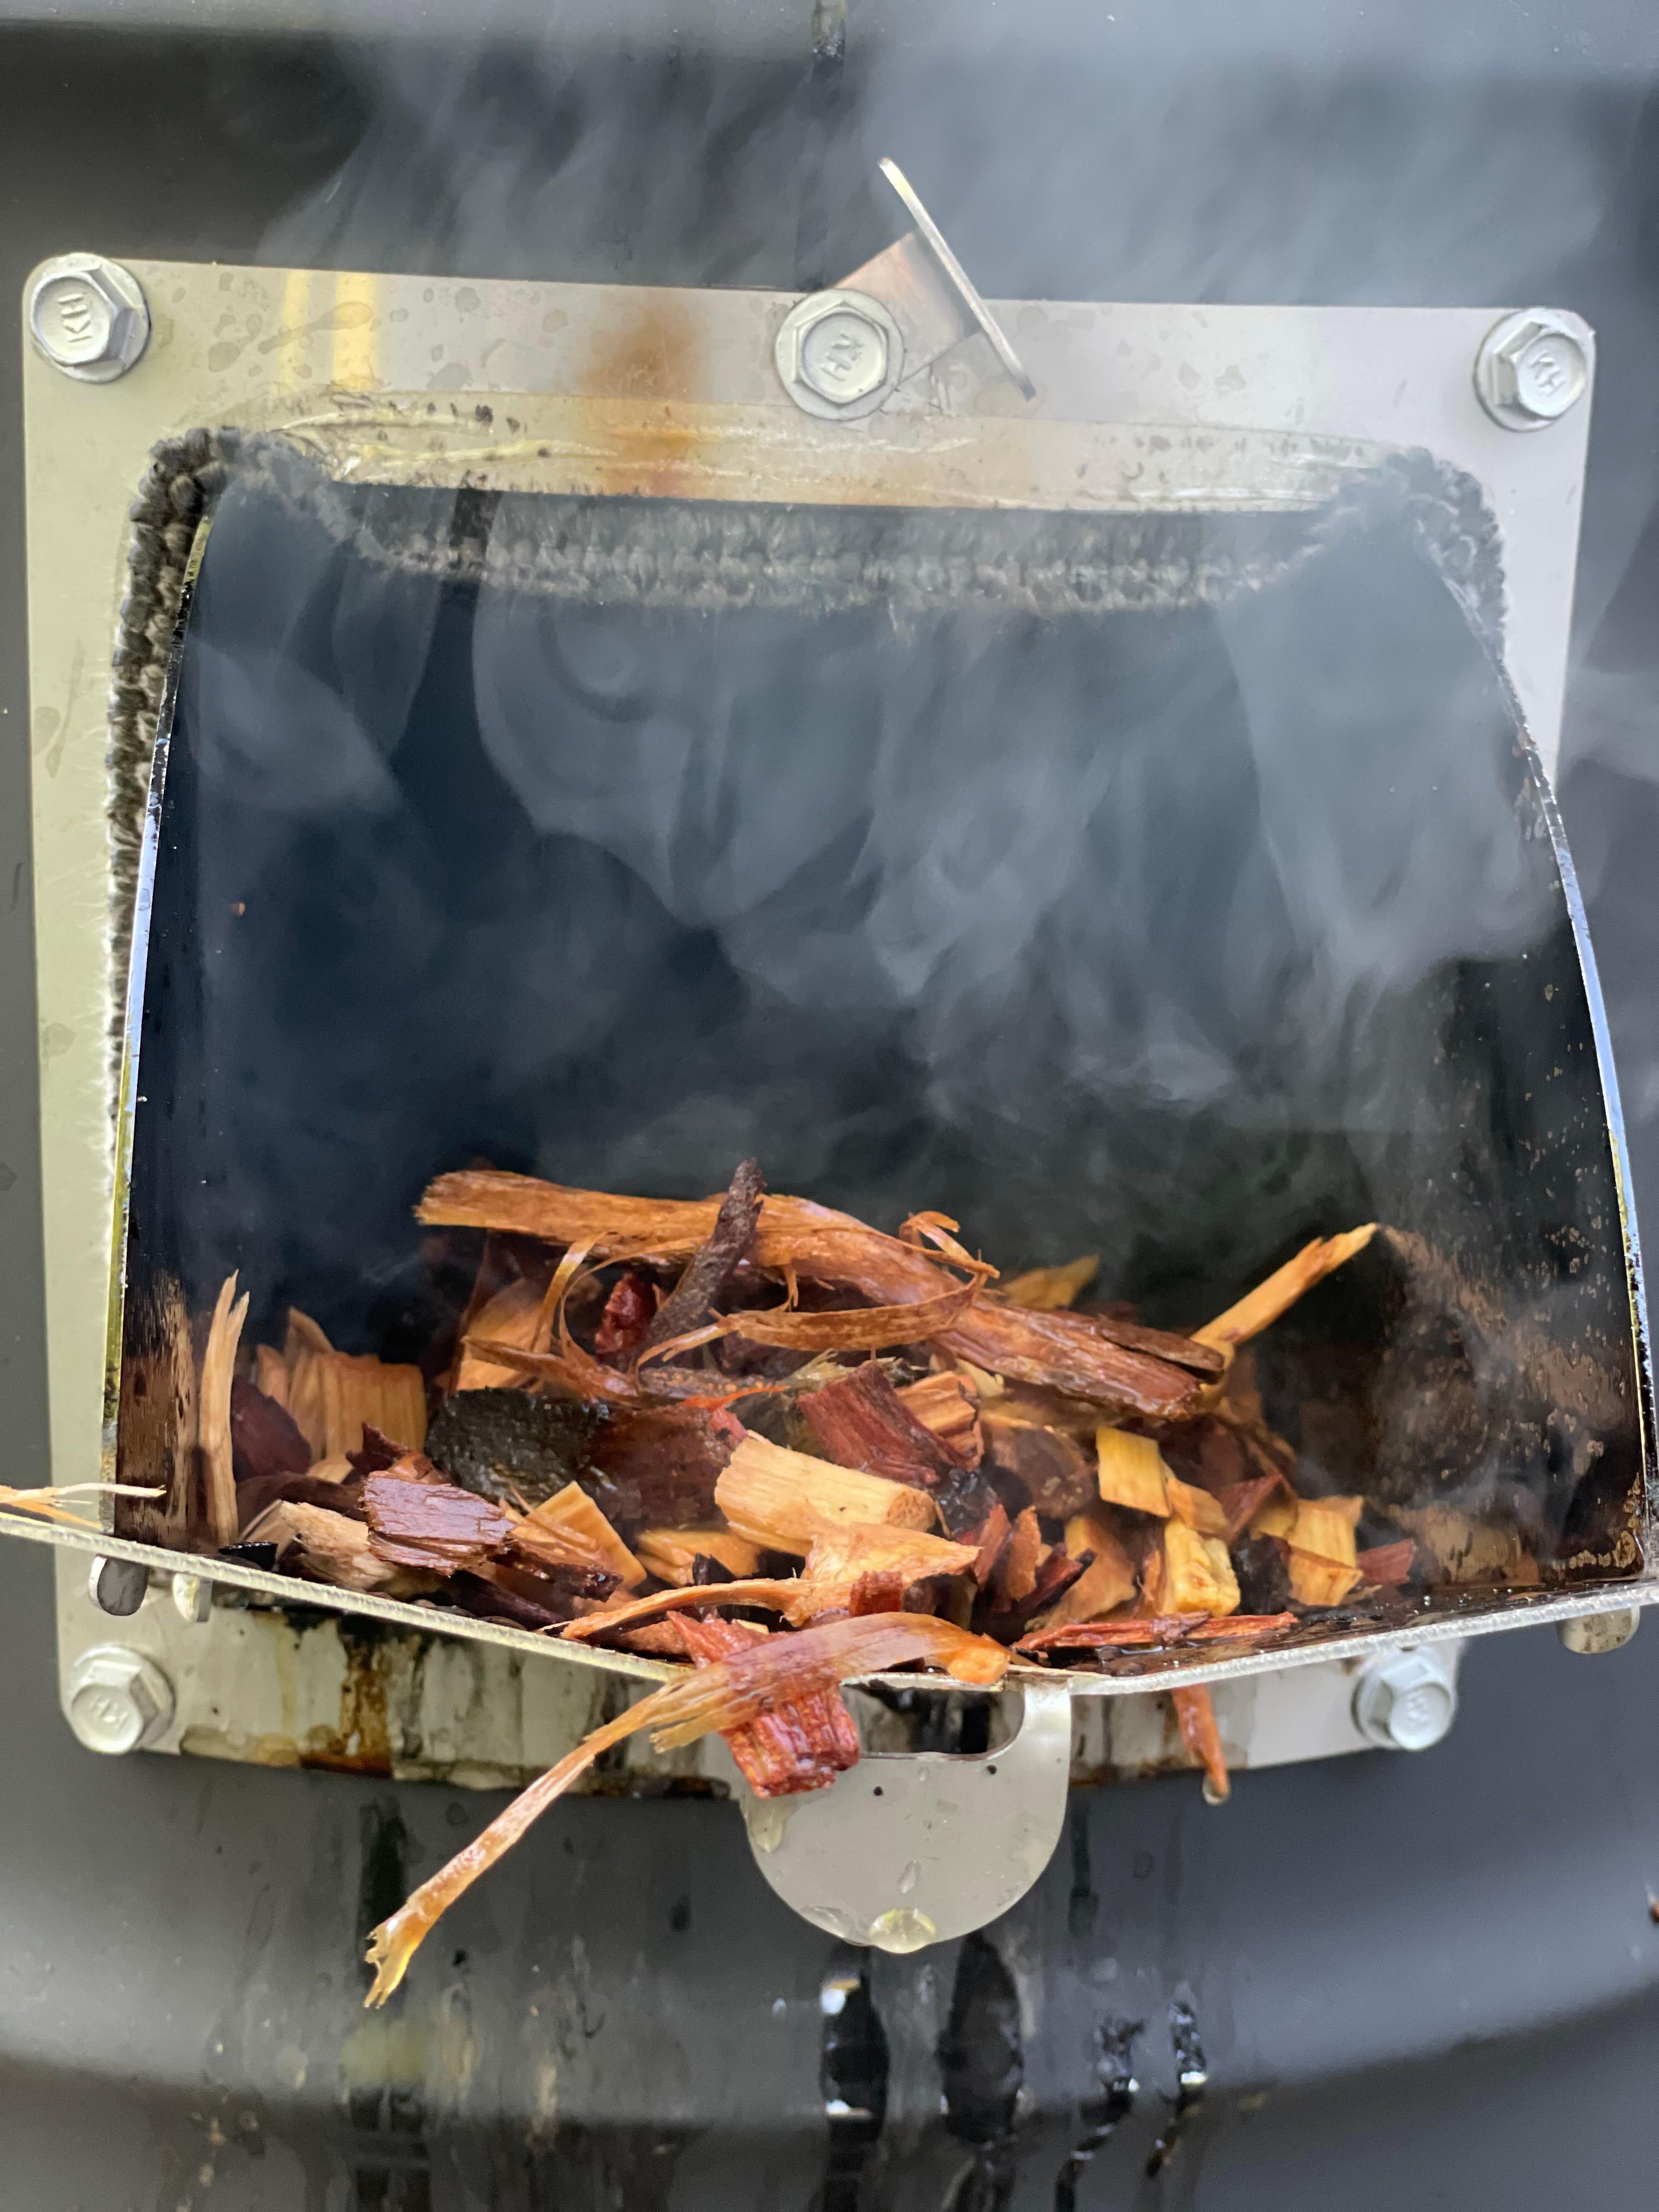 Smokin ugly ribs